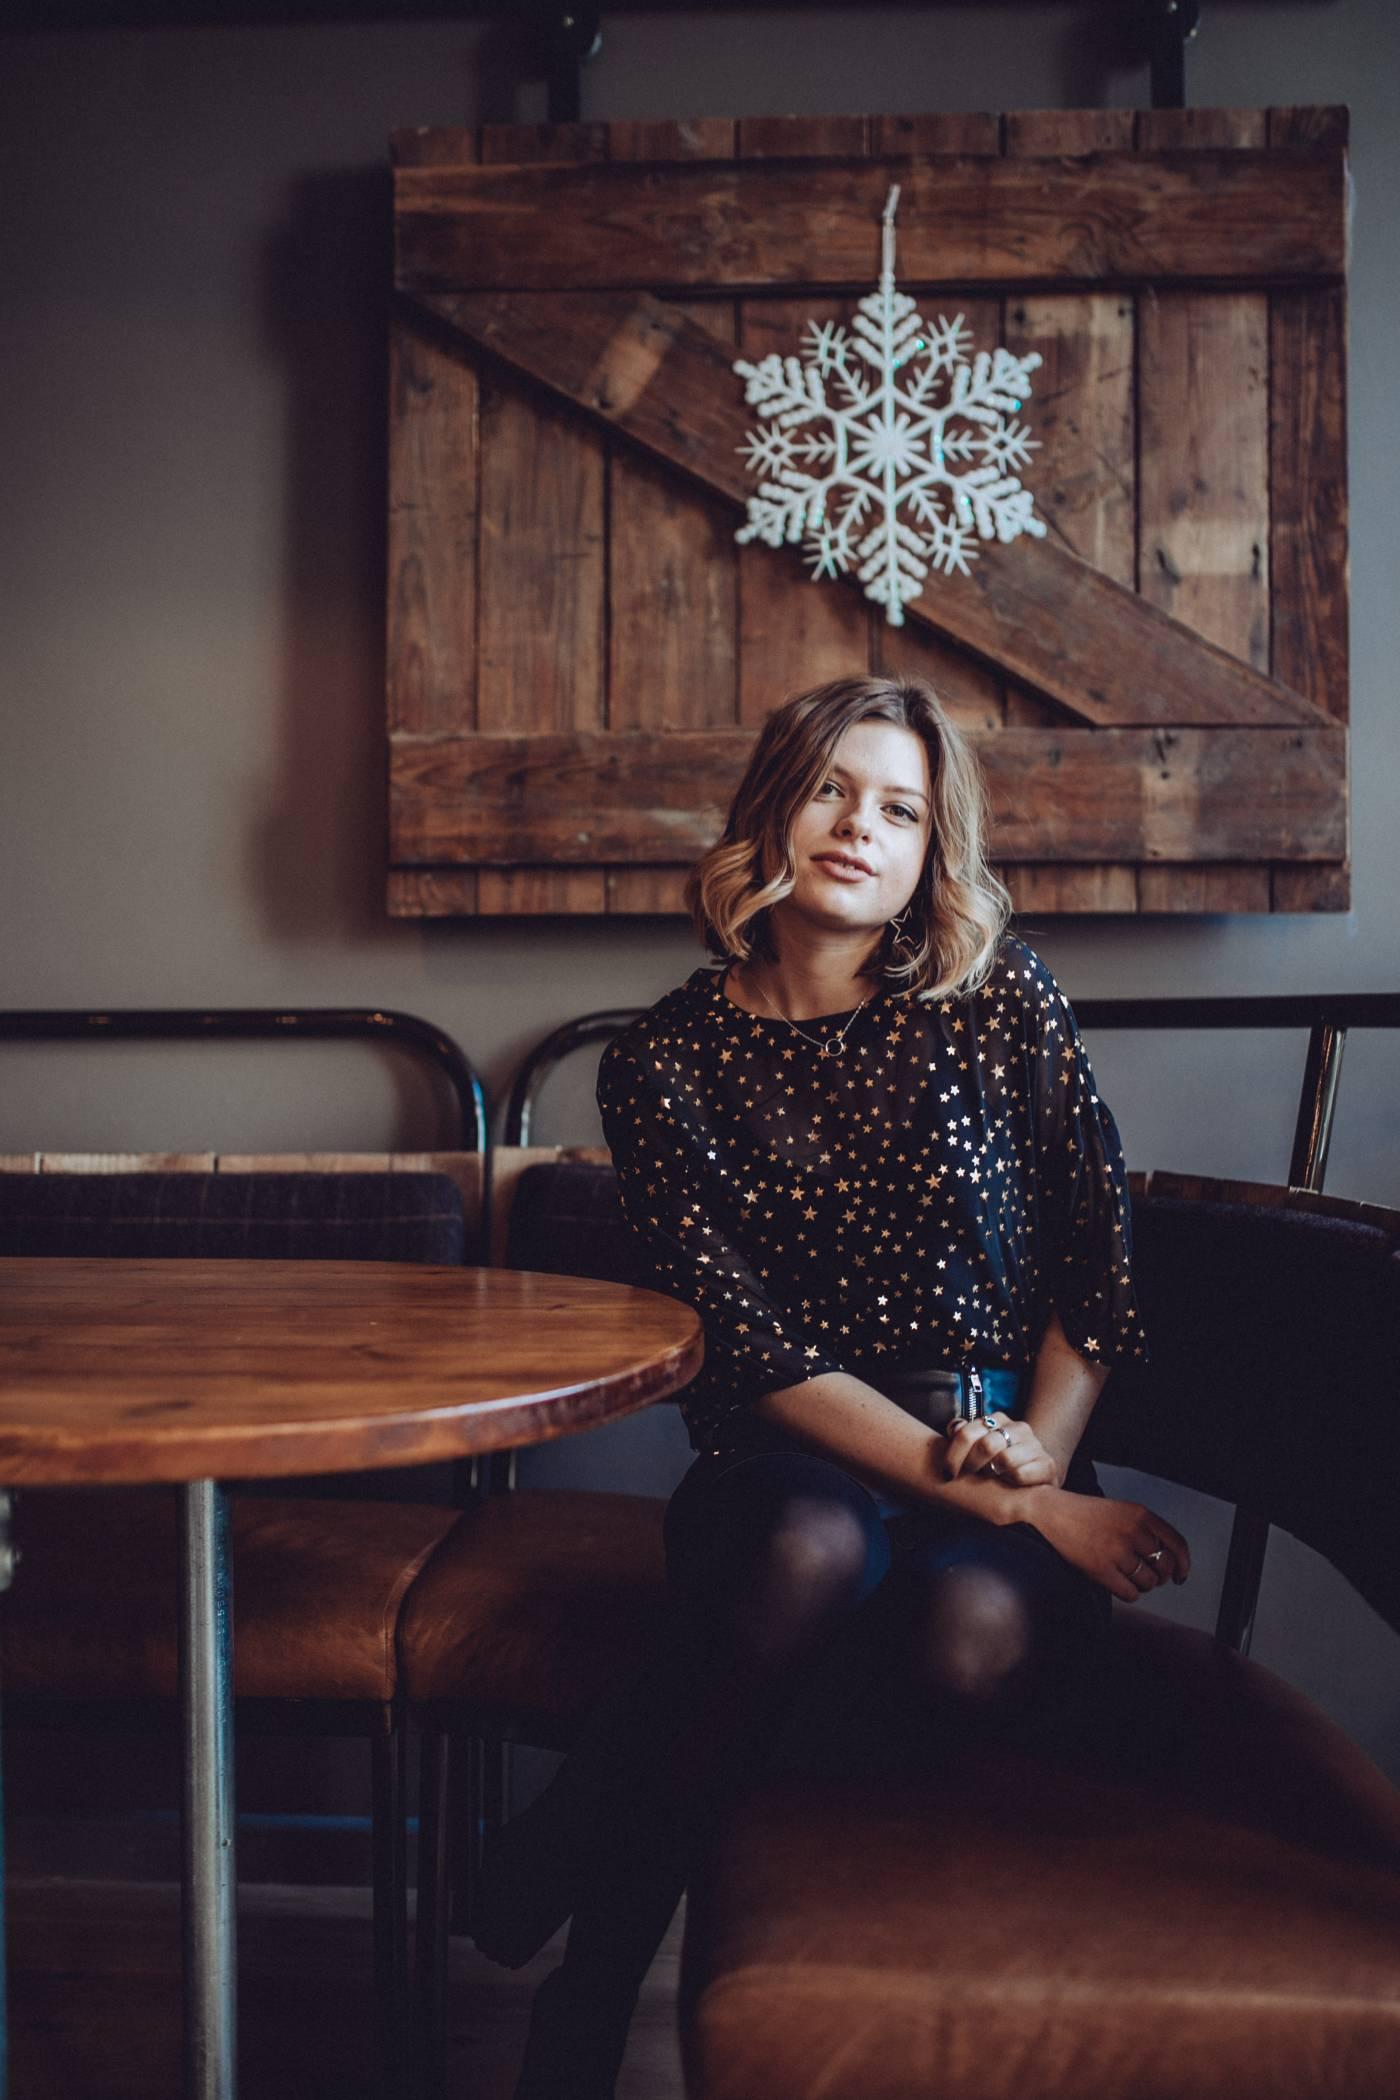 Sophie etc, Milton Keynes Blogger, MK Blogger, Food blogger, Travel Blogger, Lifestyle Blogger